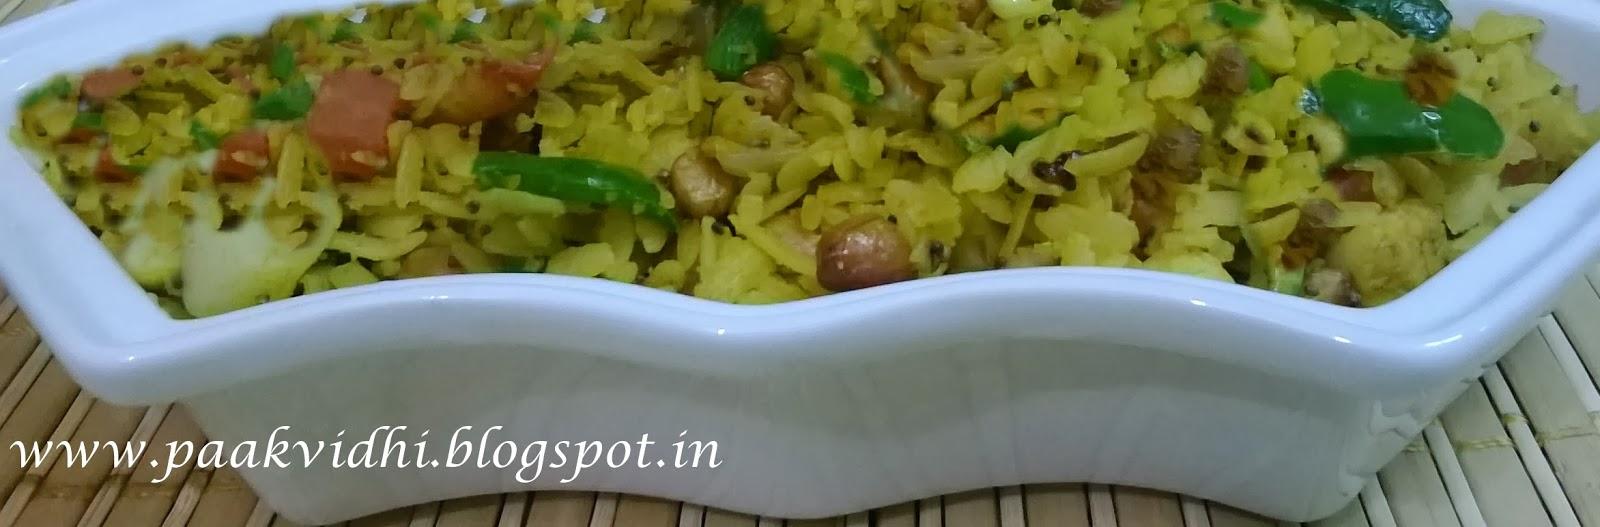 http://paakvidhi.blogspot.in/2014/02/pohachirwa.html